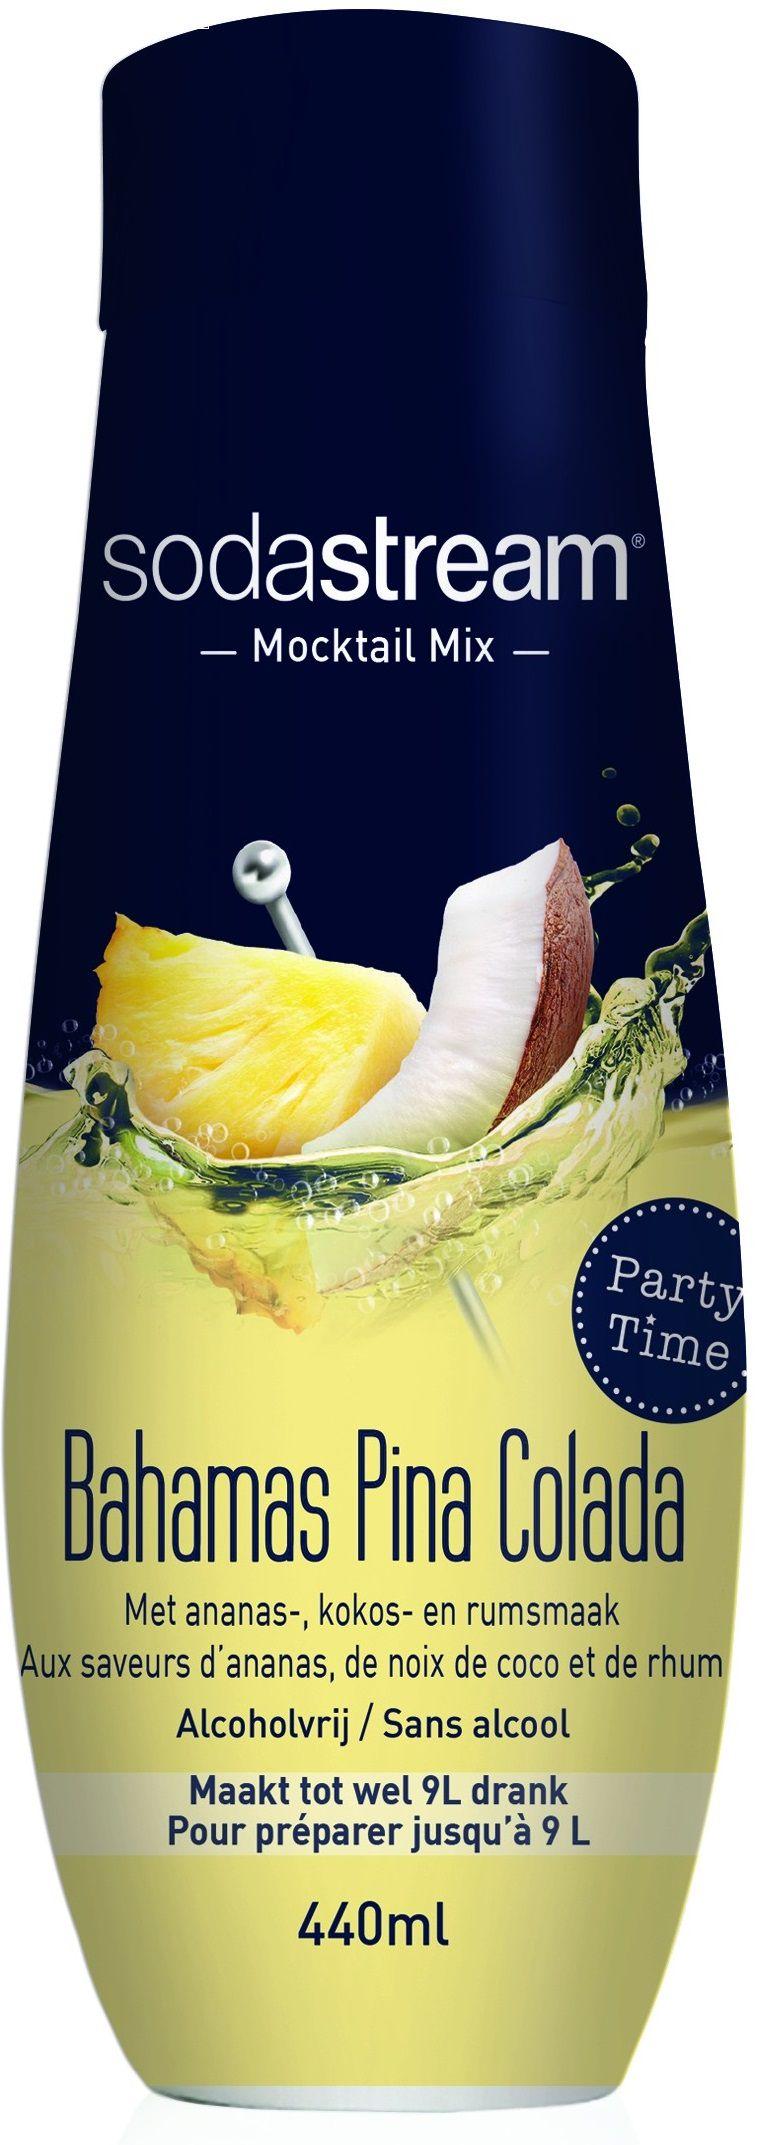 Sodastream Siroop Mocktail Bahama's Pina Colada